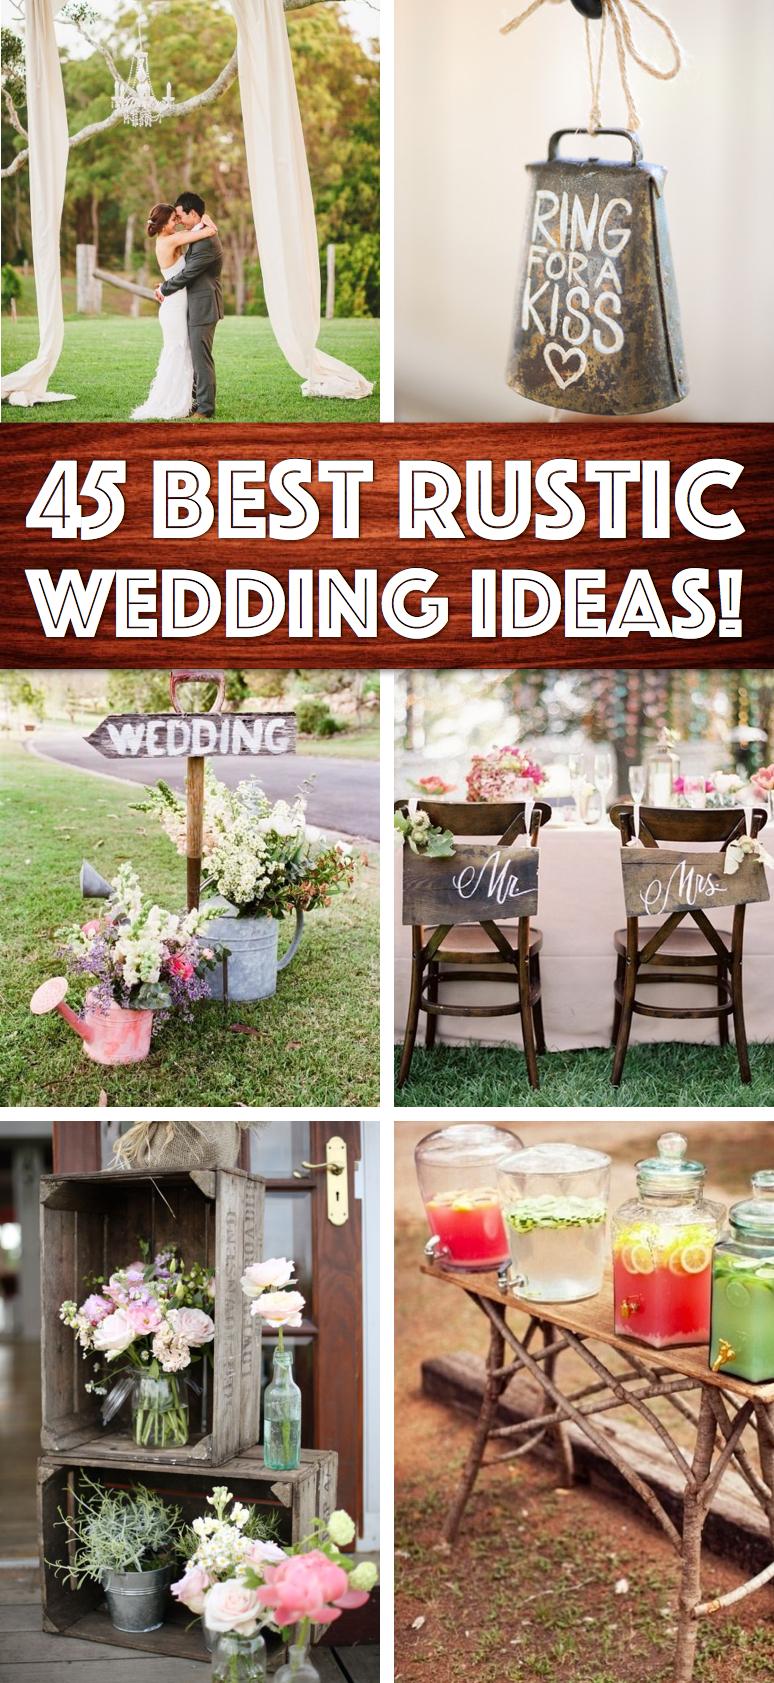 20 Awesome Outdoor Garden Wedding Ideas To Inspire Elegantweddinginvites Com Blog Cheap Backyard Wedding Outdoor Wedding Decorations Rustic Wedding Backdrops